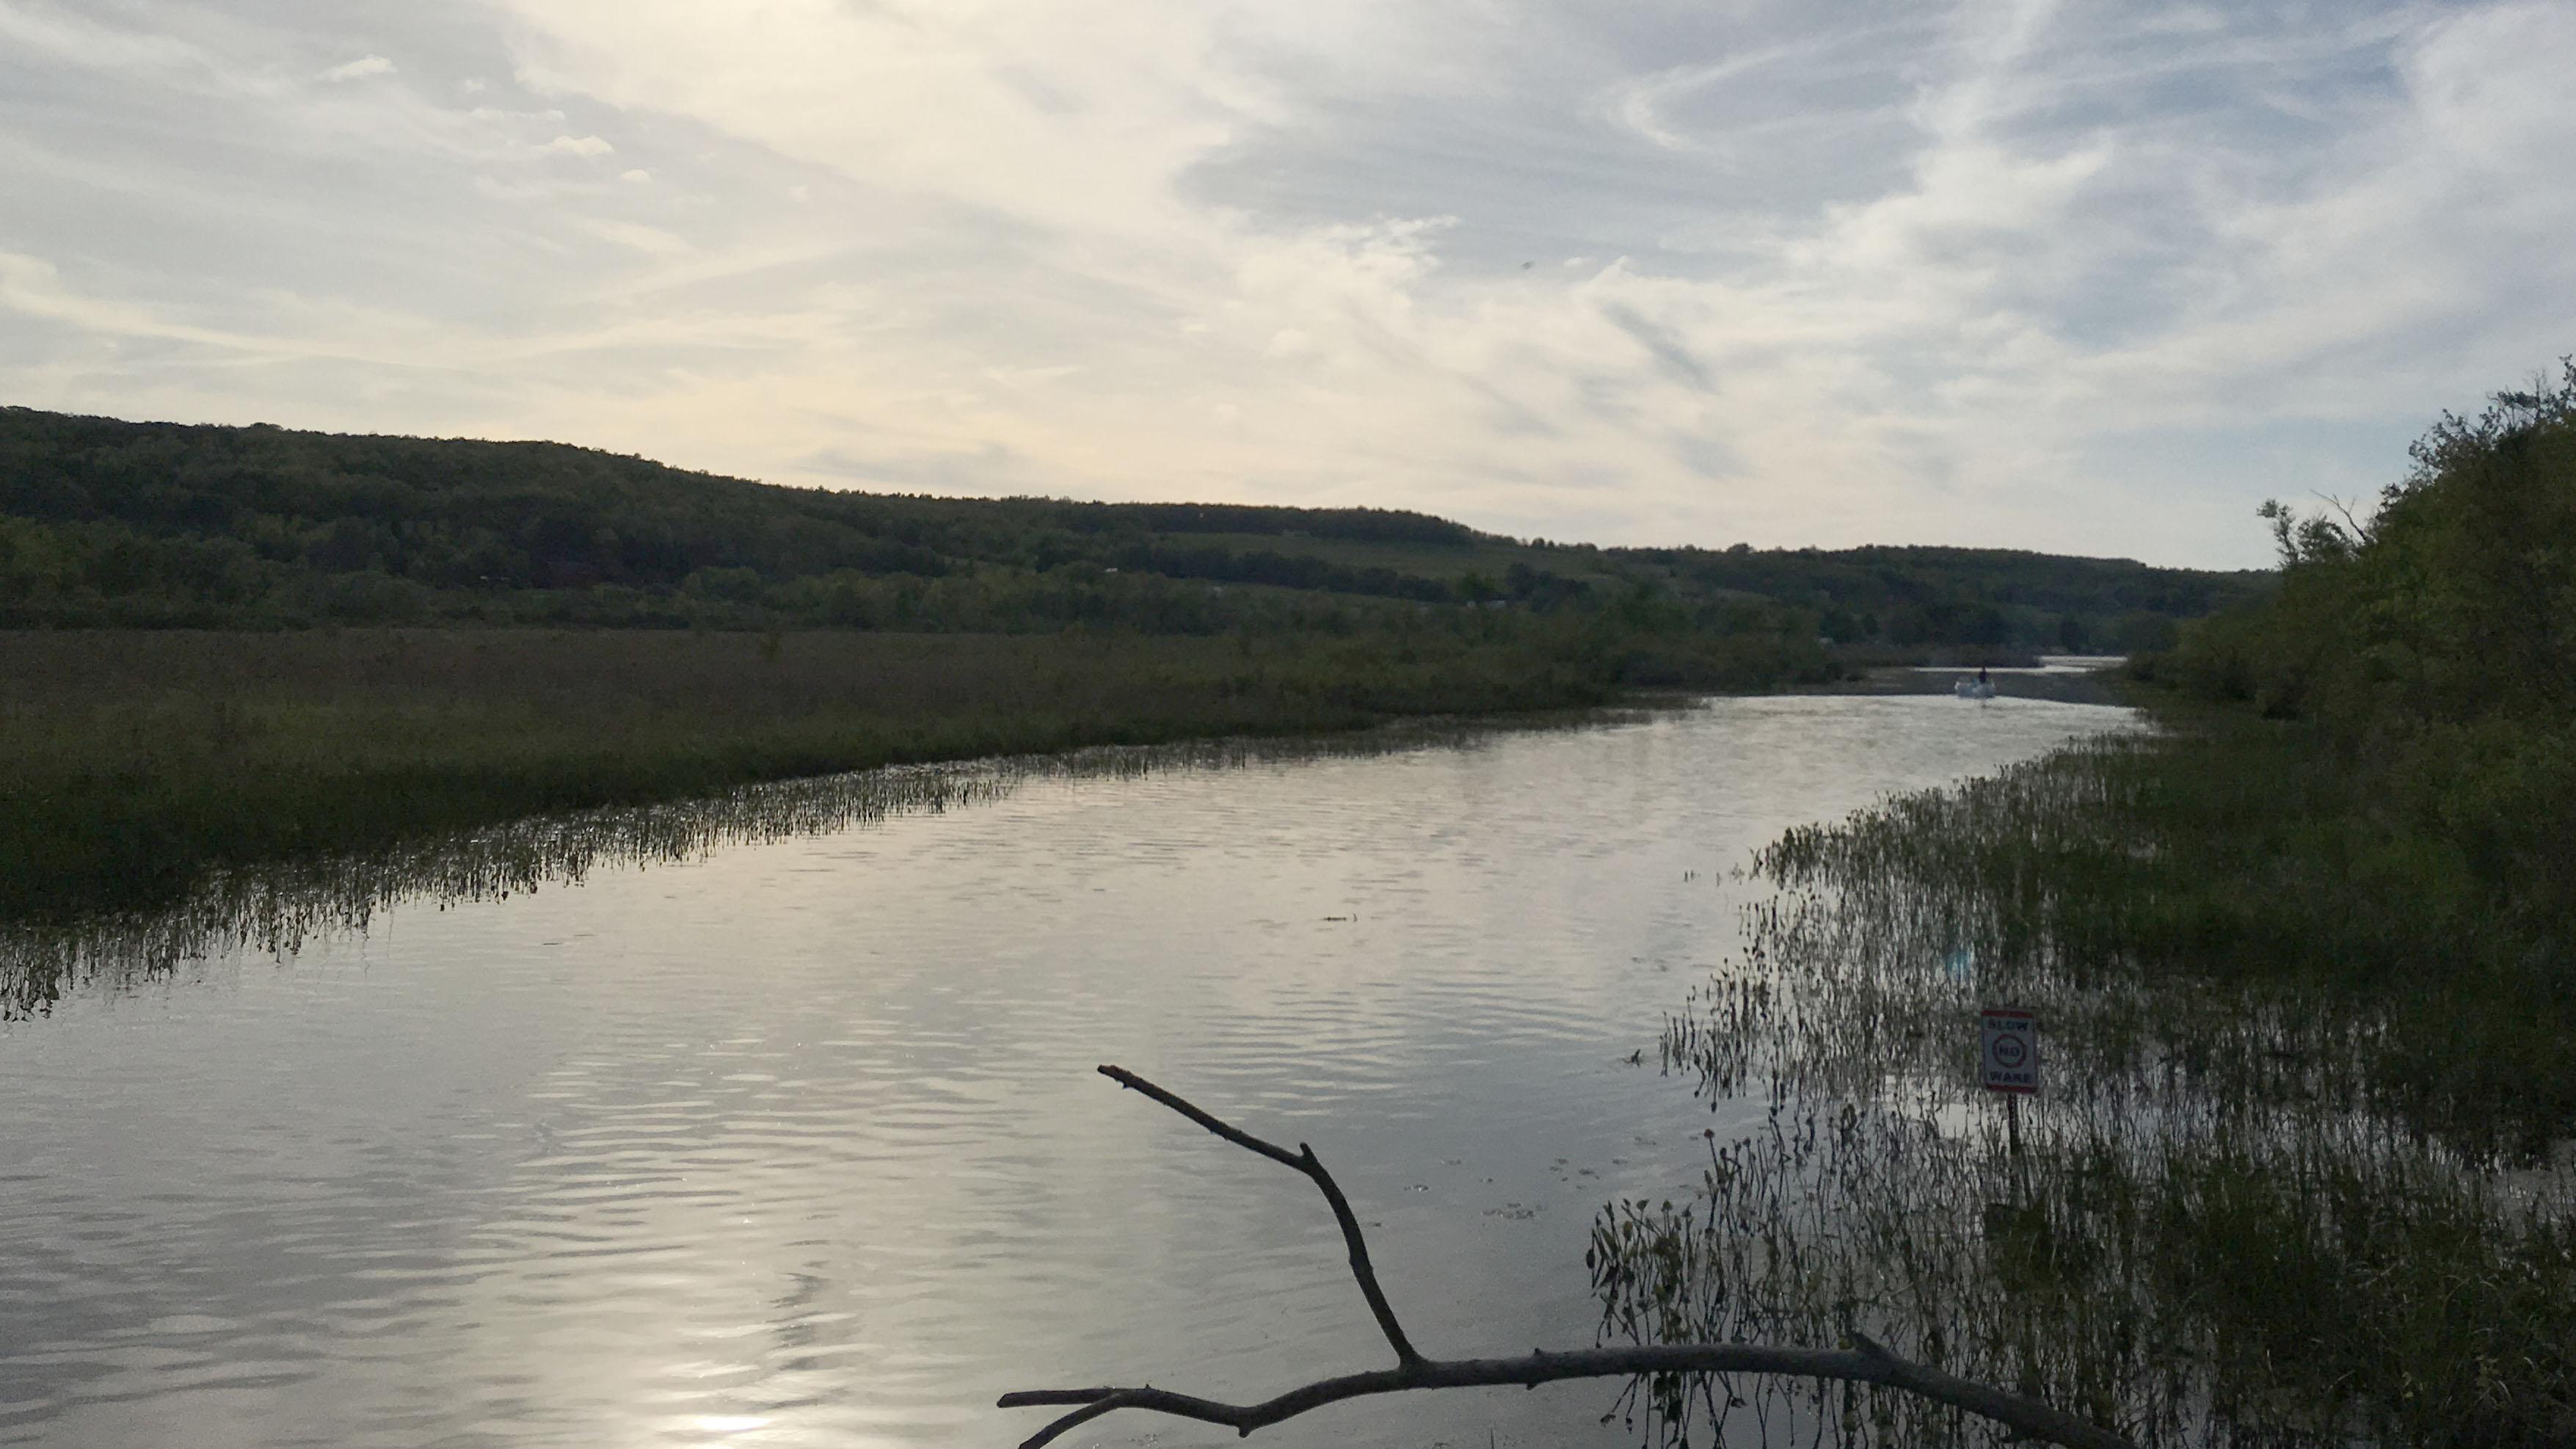 View towards Waneta Lake